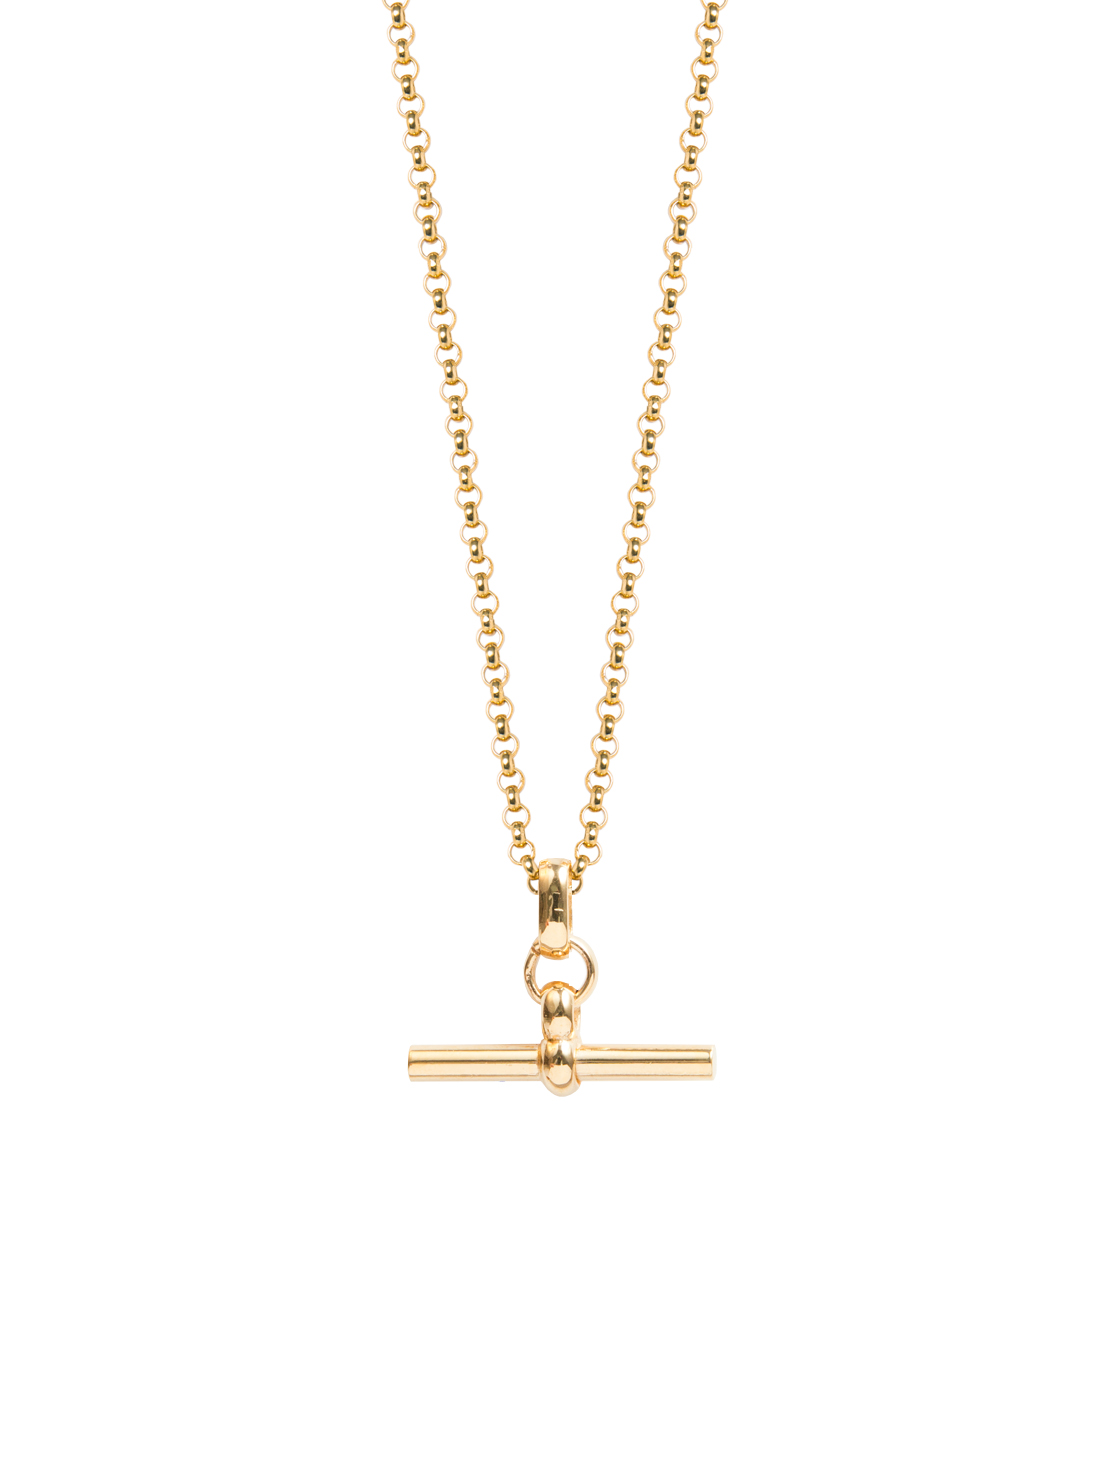 Small Gold T Bar On Fine Gold Belcher Chain Tilly Sveaas Jewellery